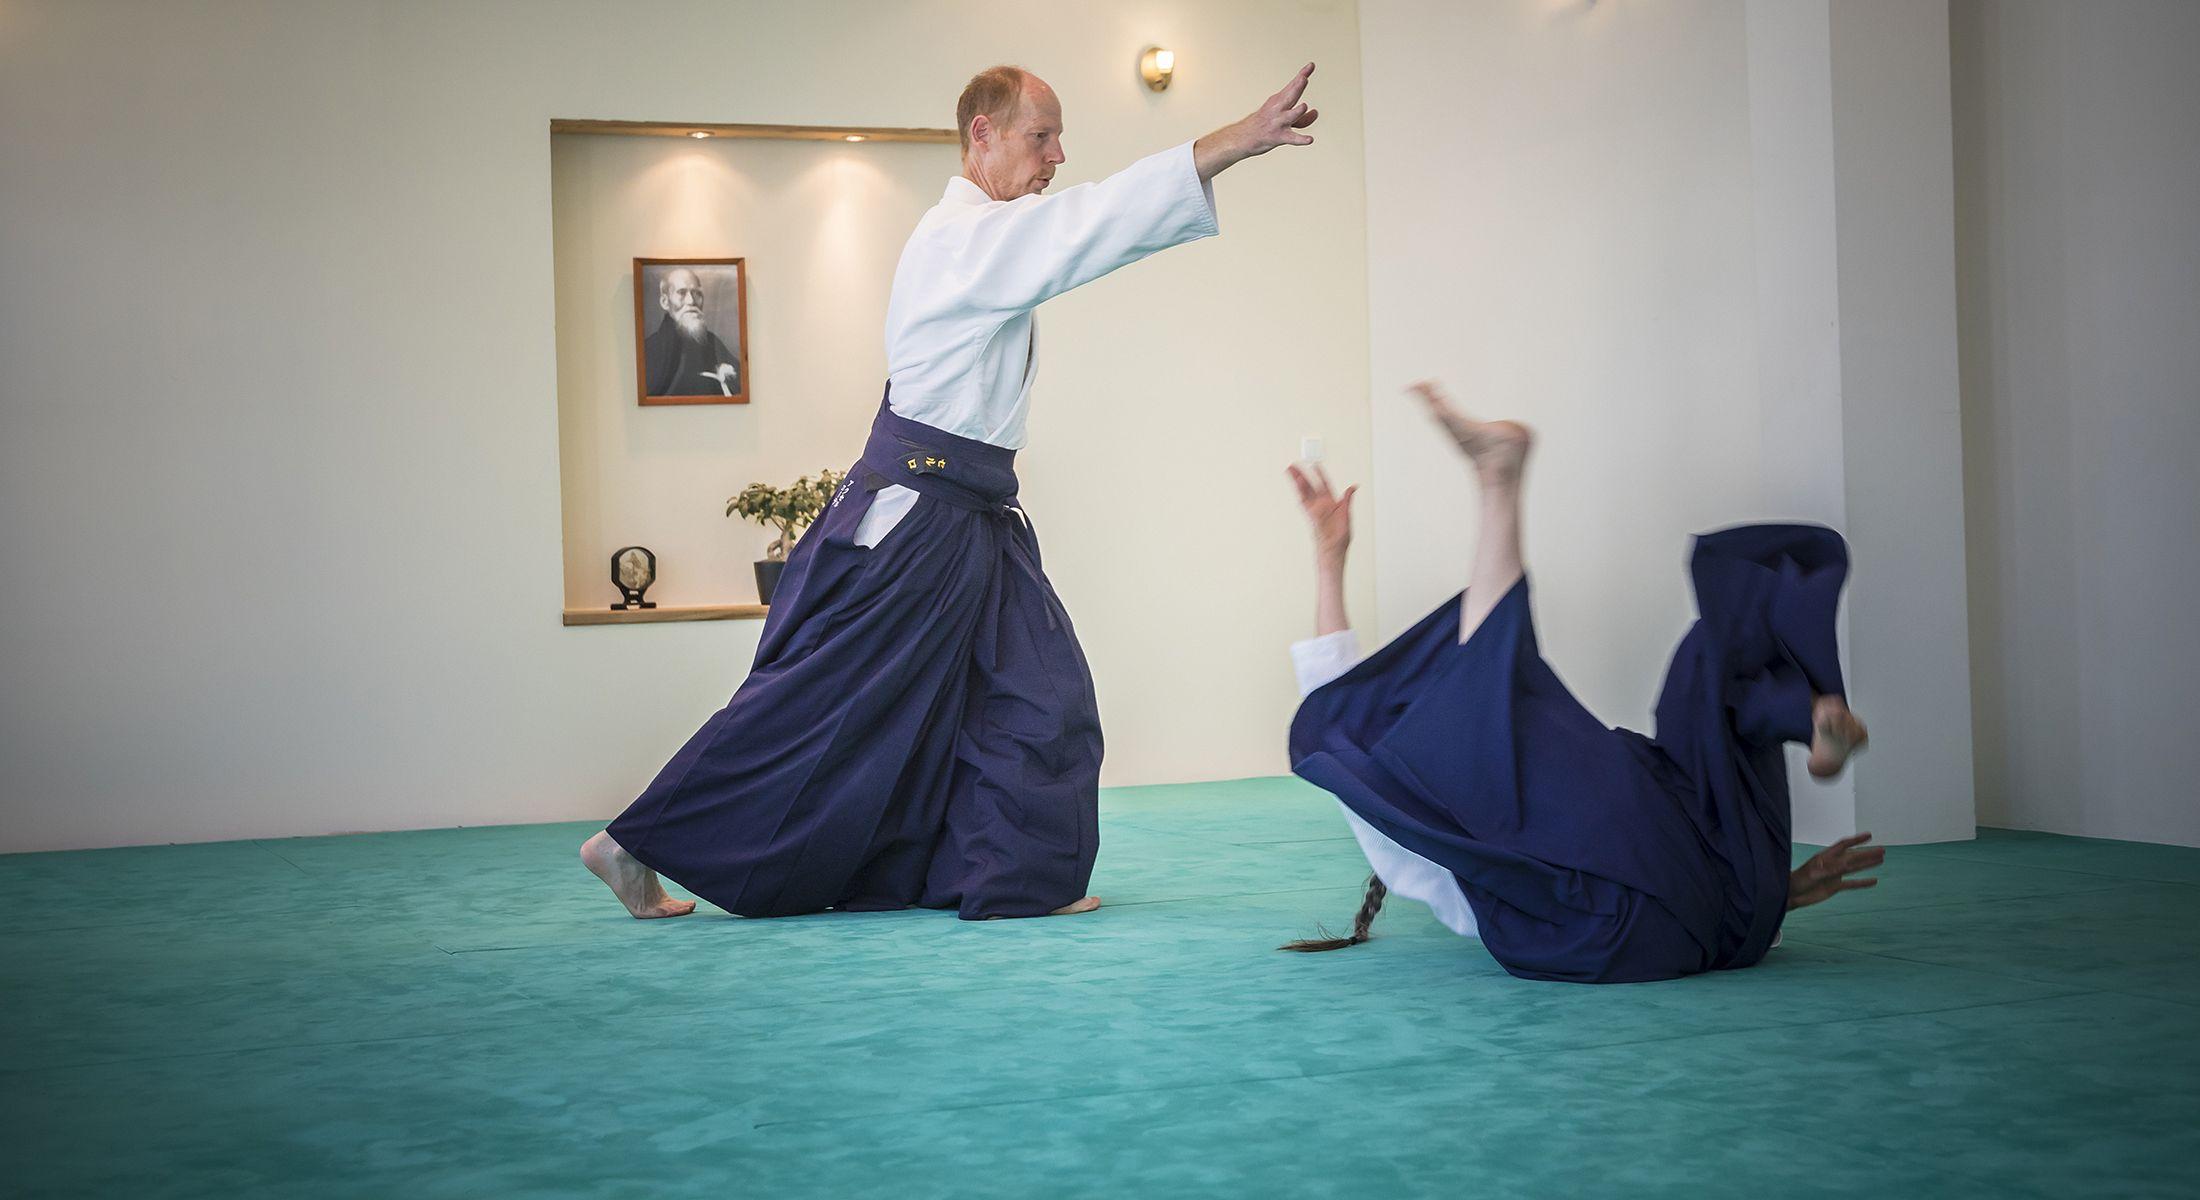 http://www.aikido-schule-bielefeld.de/wp-content/uploads/2018/12/slider05_1.jpg